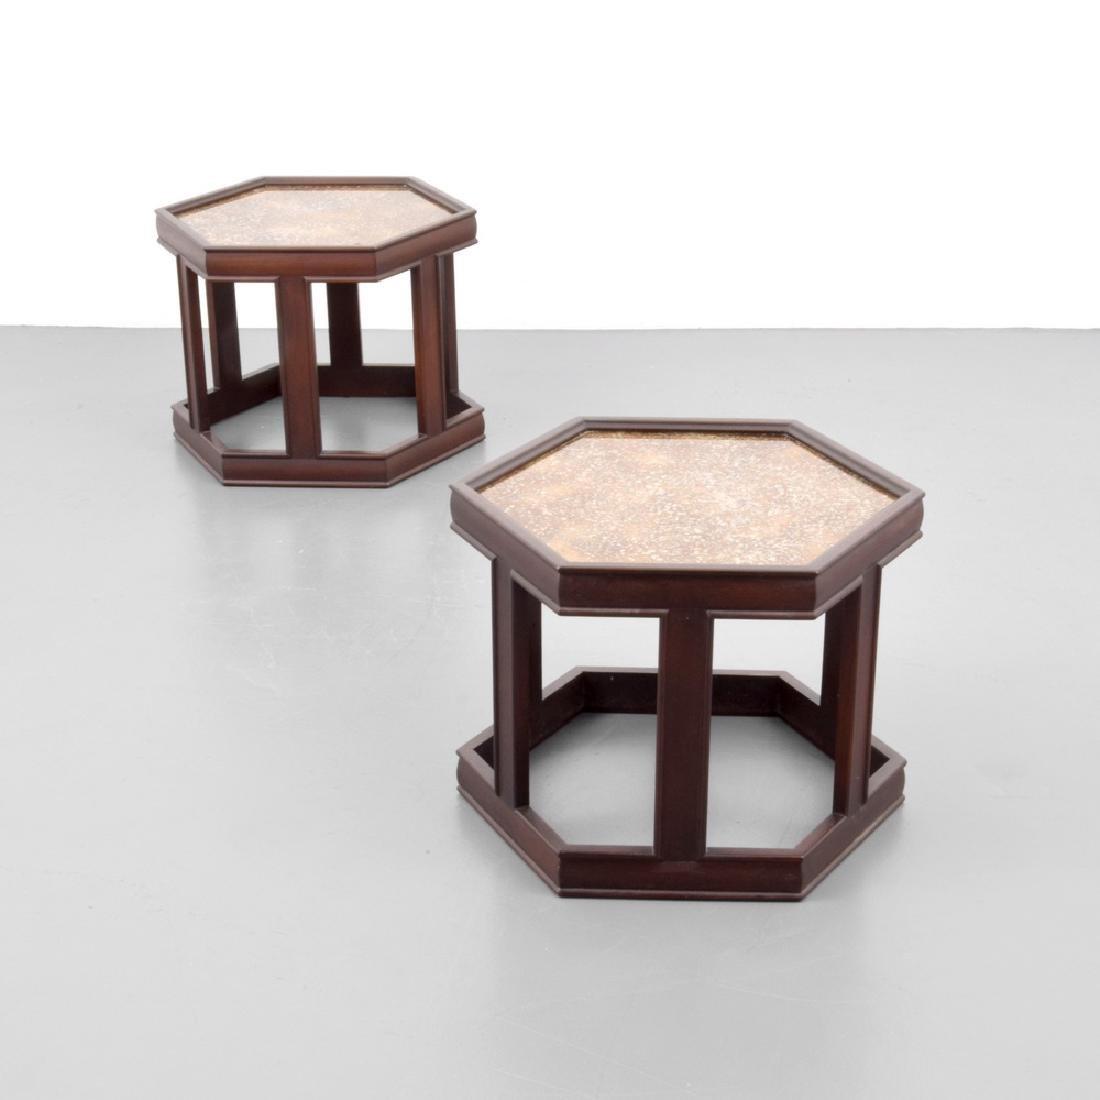 Pair of John Keal Hexagonal Side Tables